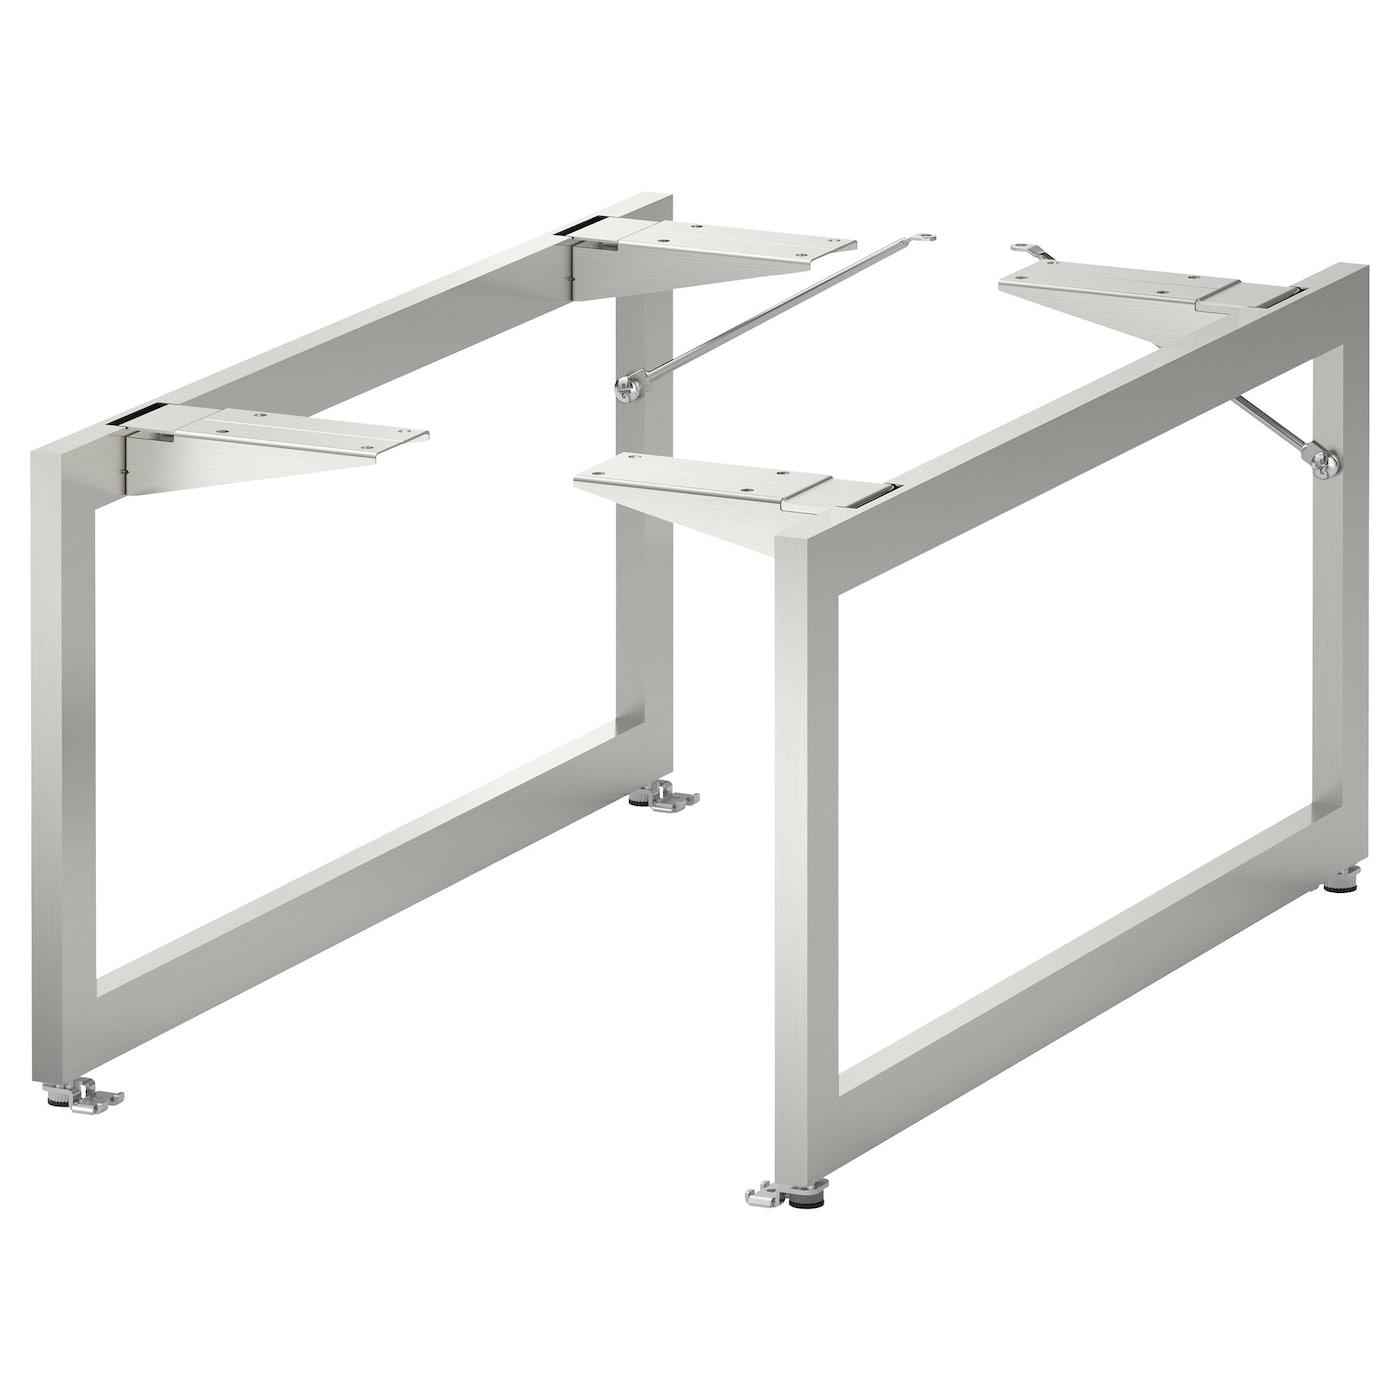 limhamn pied acier inoxydable 28x58 cm ikea. Black Bedroom Furniture Sets. Home Design Ideas